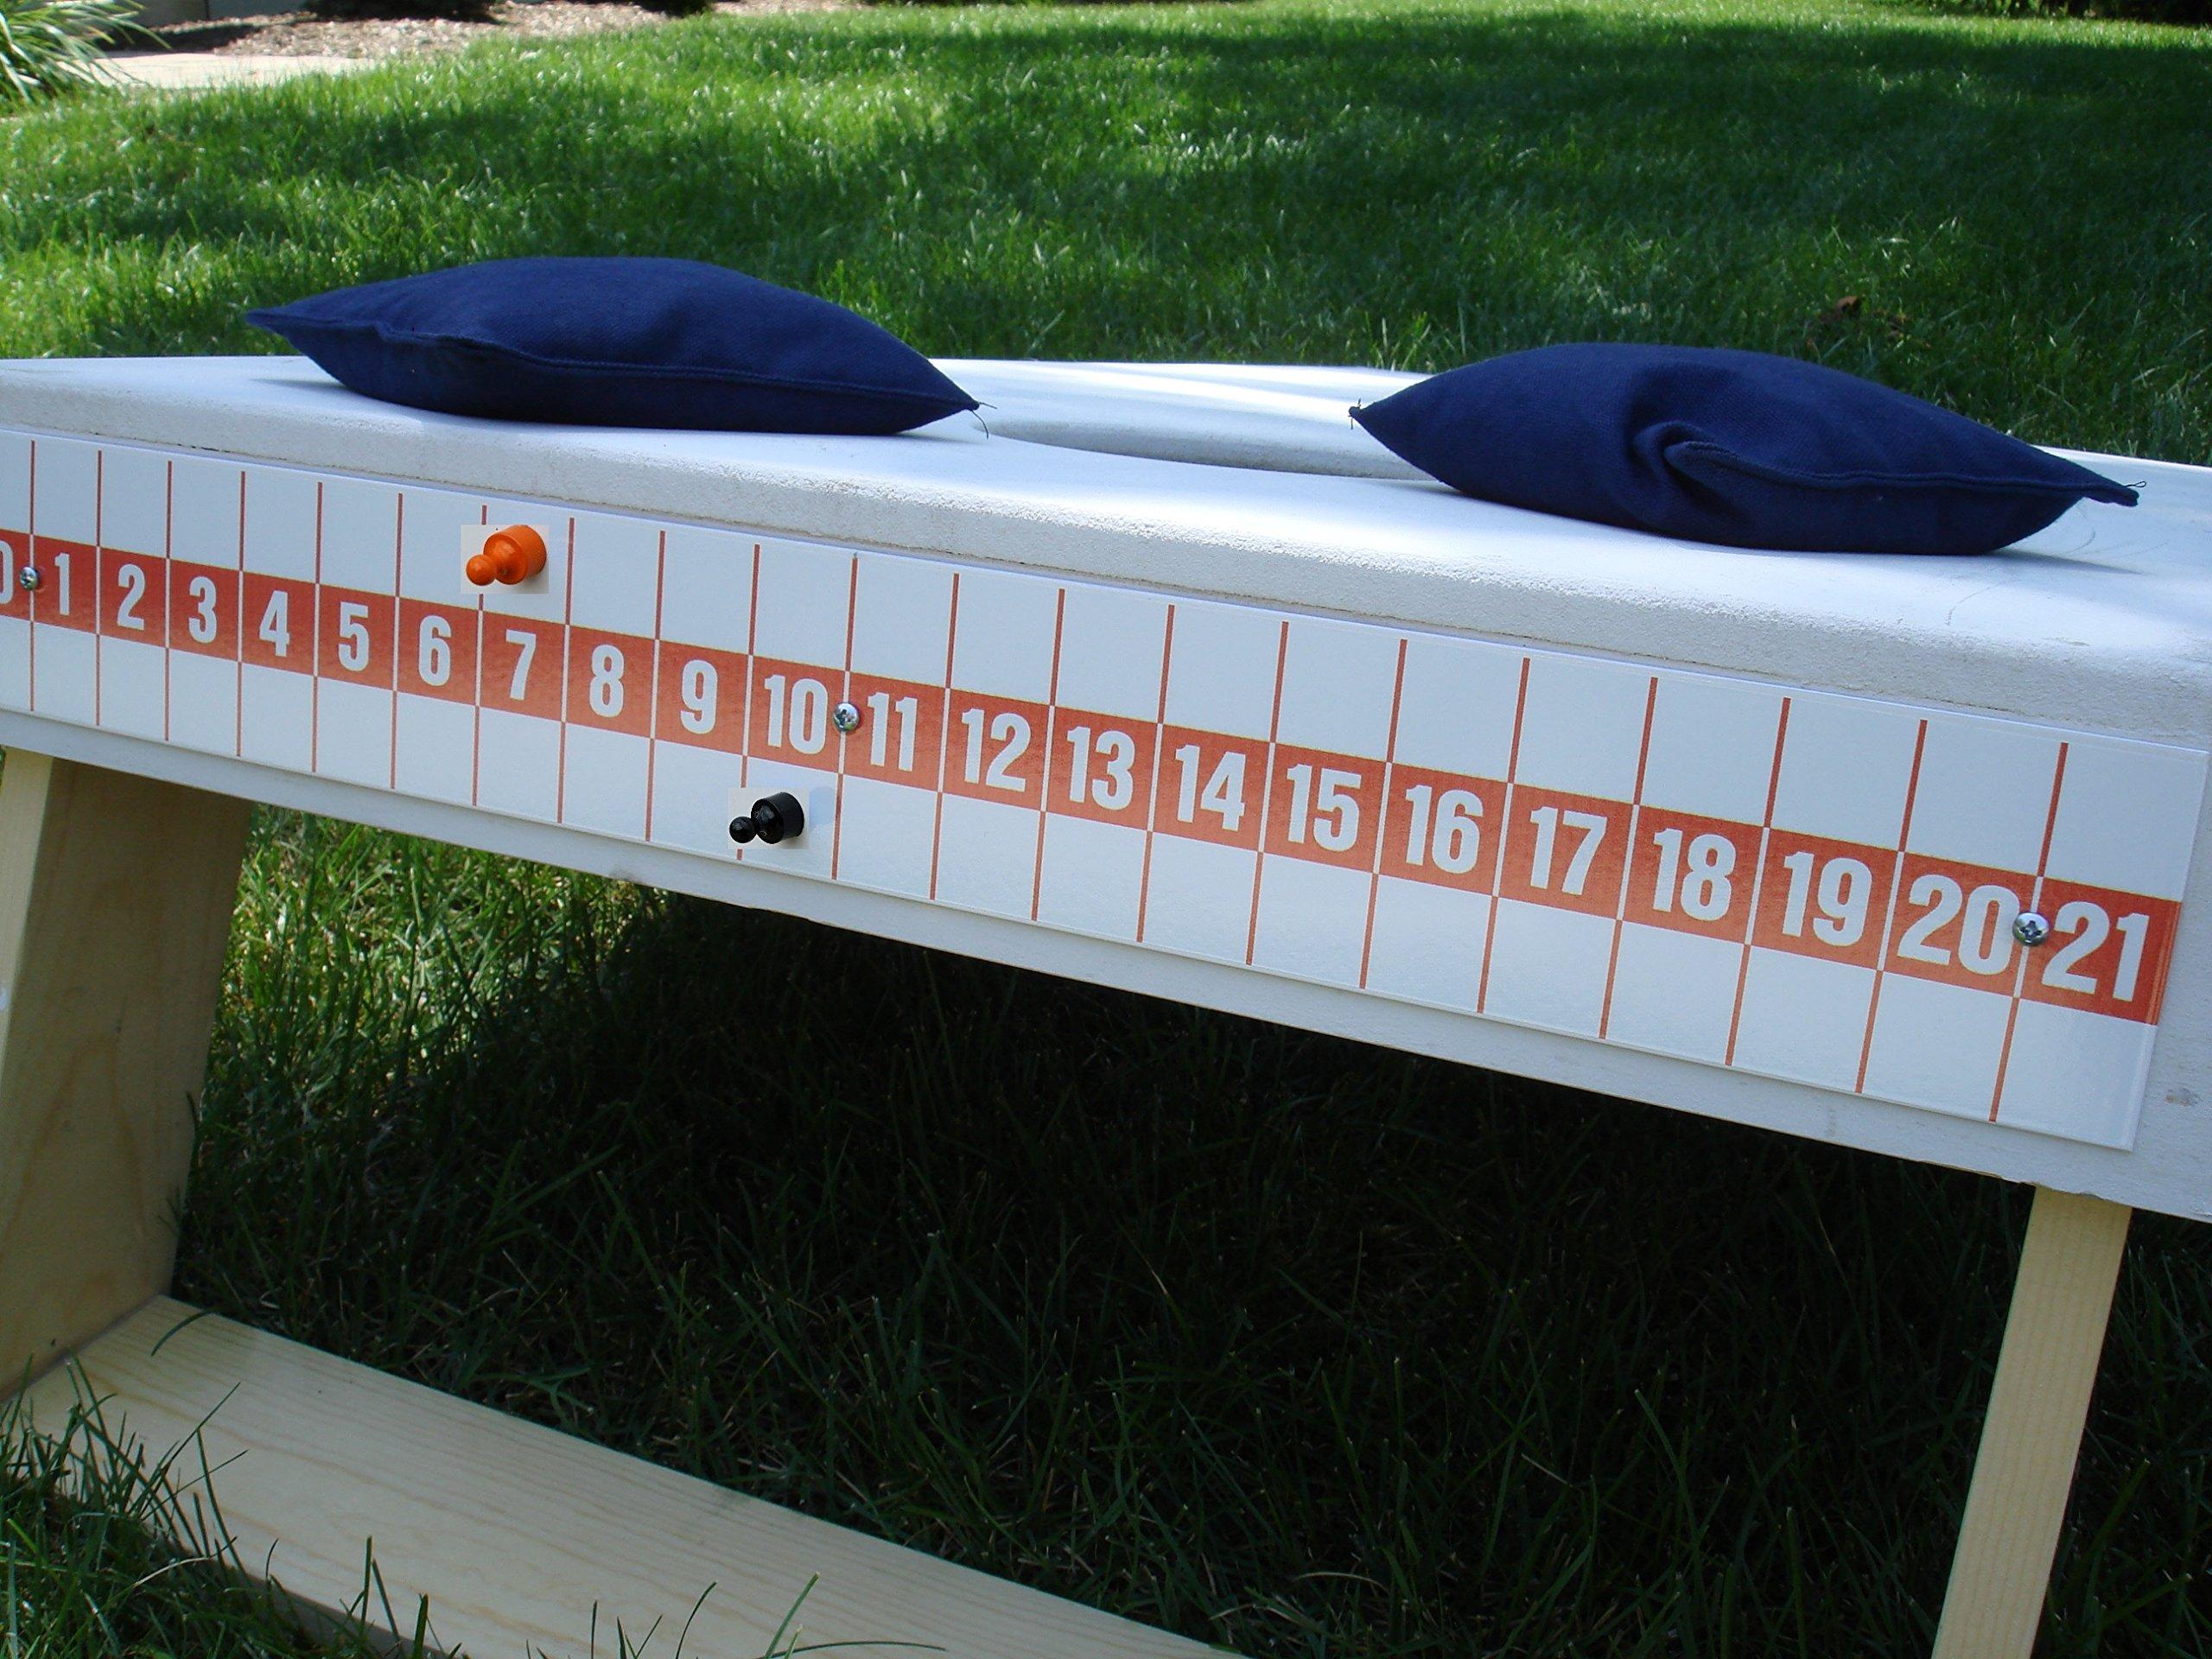 Cornhole Bag Toss Game Magnetic Scoreboard Orange on White